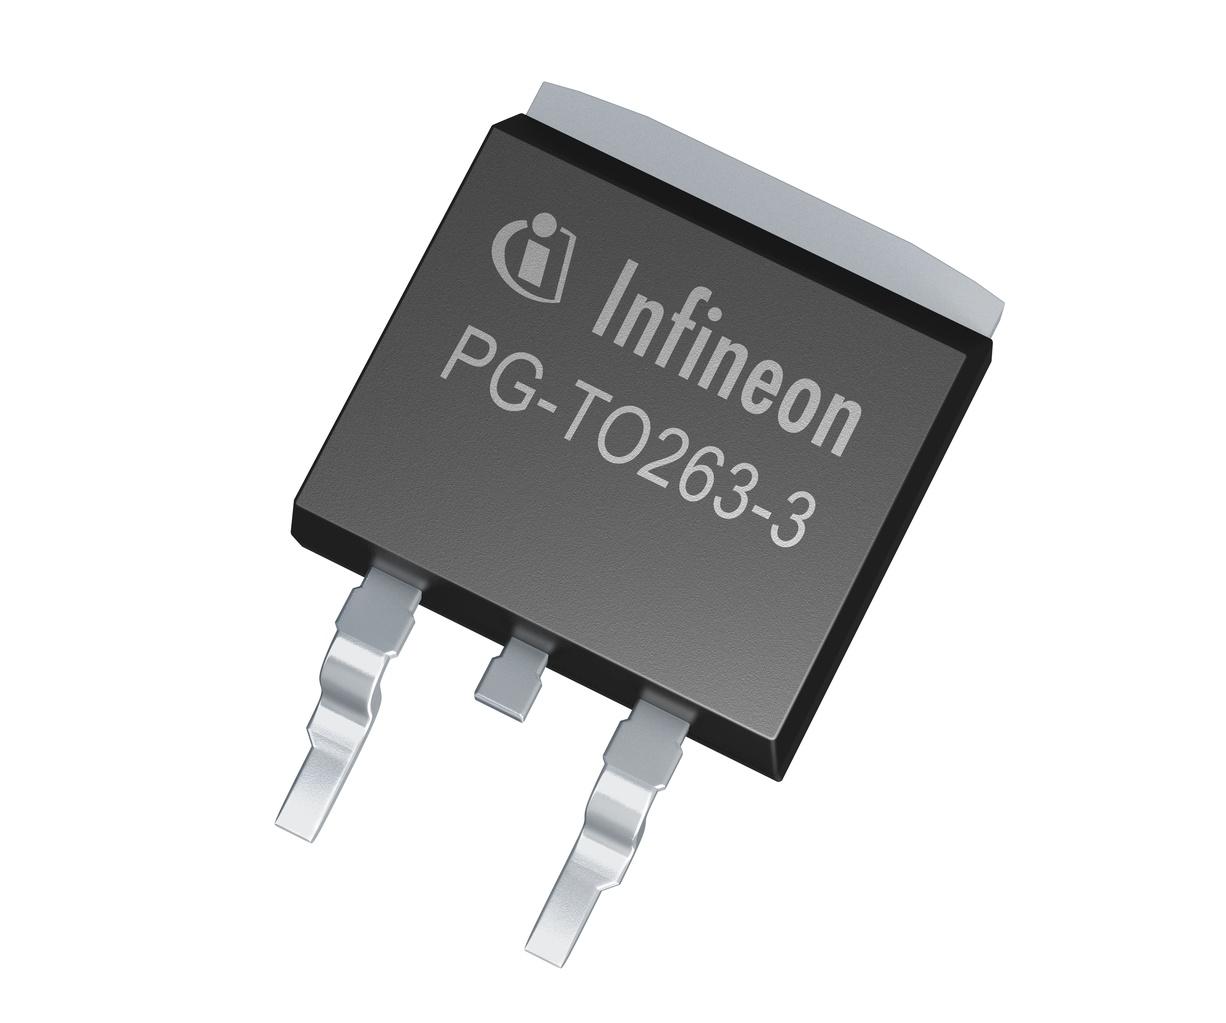 Image of IPB80P04P4L04ATMA1 by Infineon Technologies